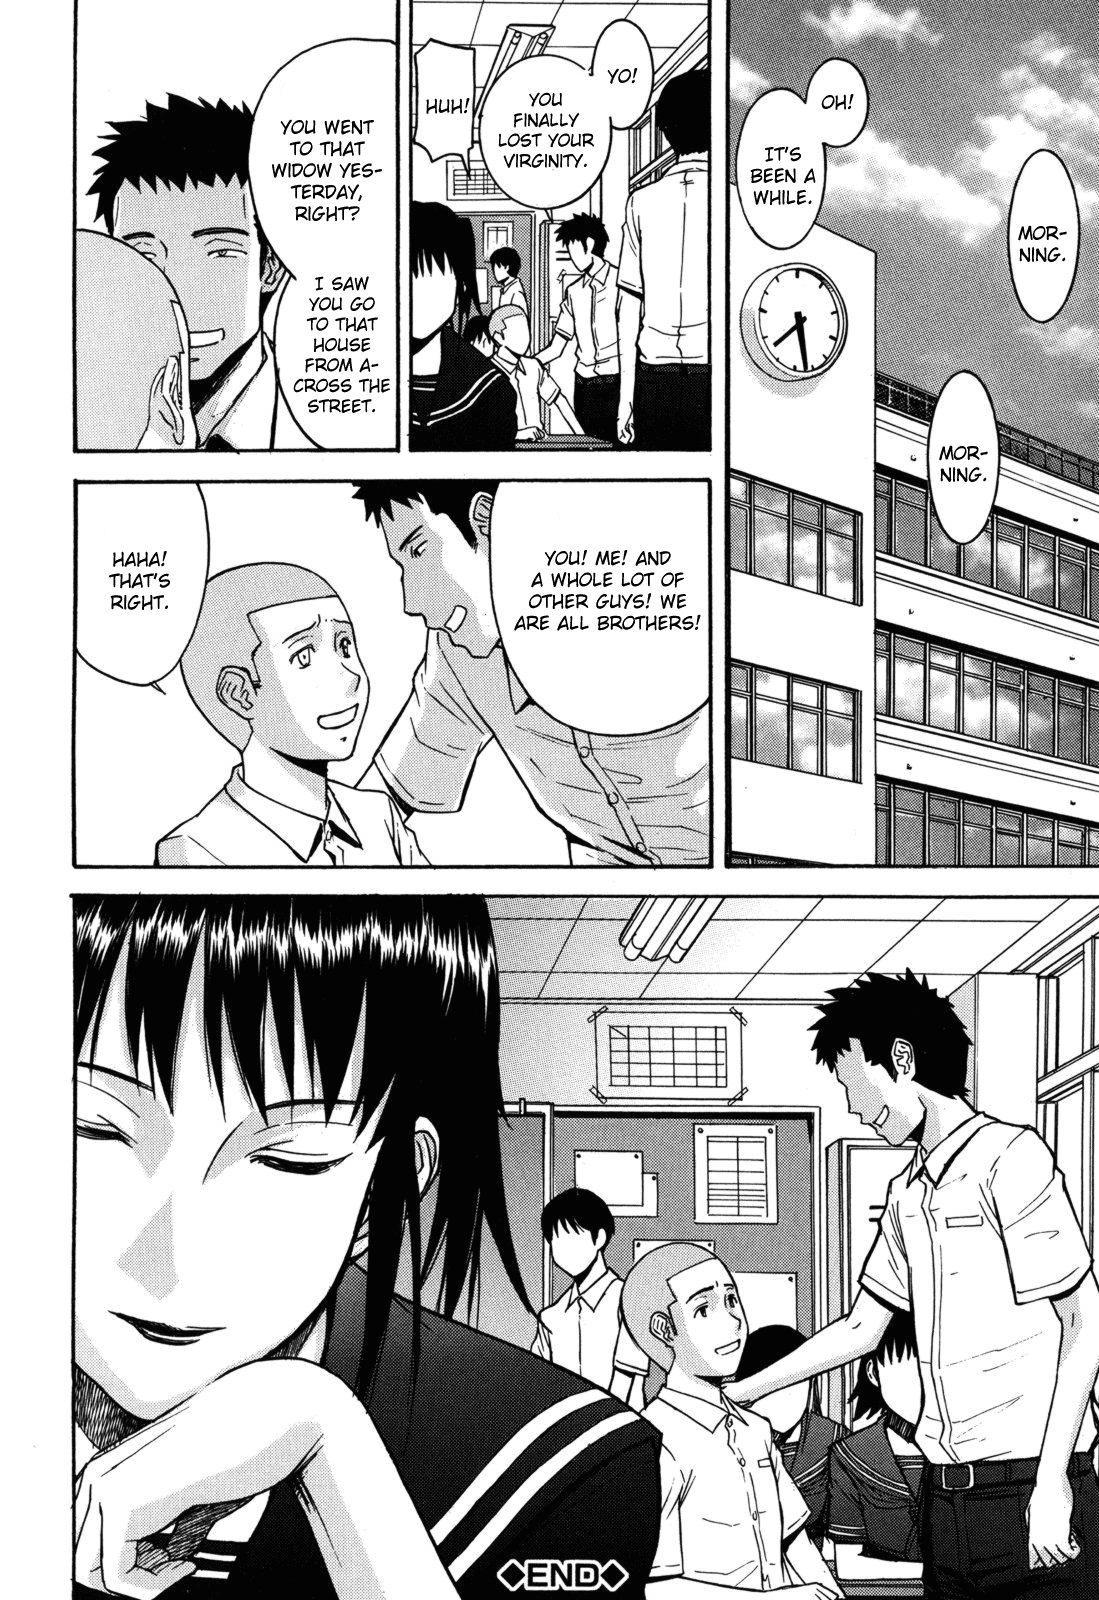 [Inomaru] 8-gatsu 31-nichi | August 31st (Camellia) [English] [CGrascal] [Decensored] 22